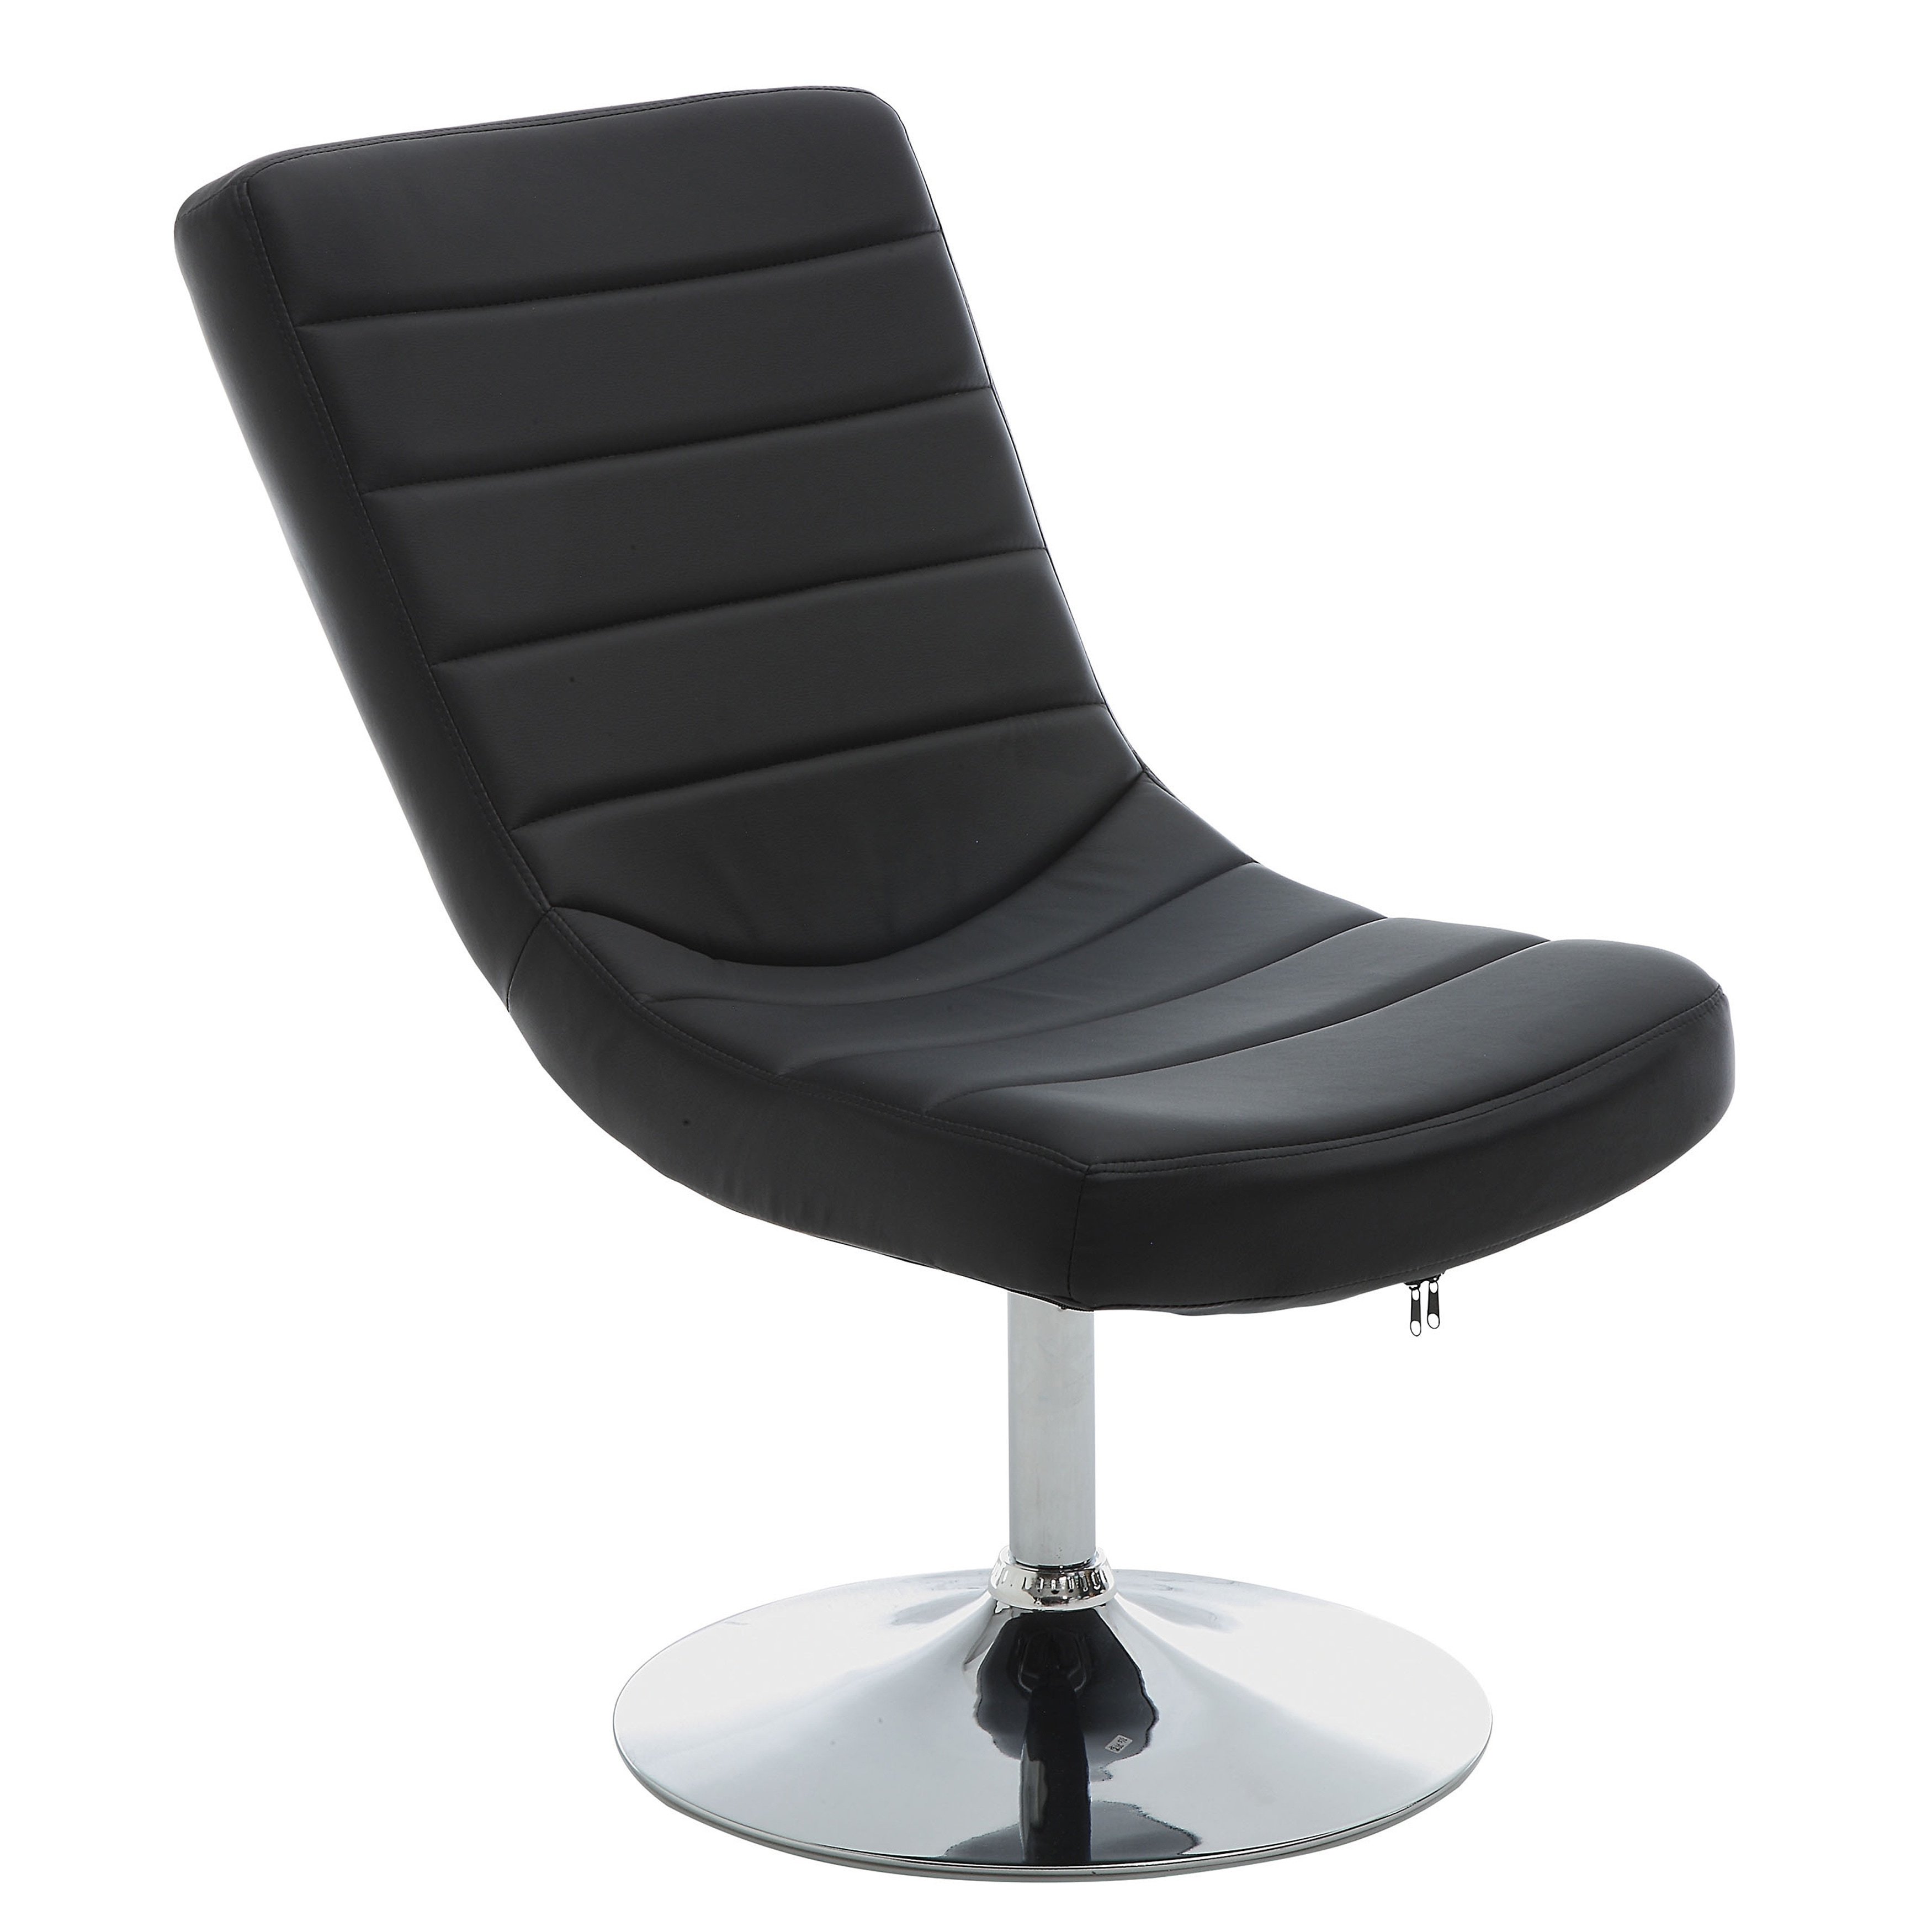 Furniture Of America Tracelli Contemporary 2 Piece Faux